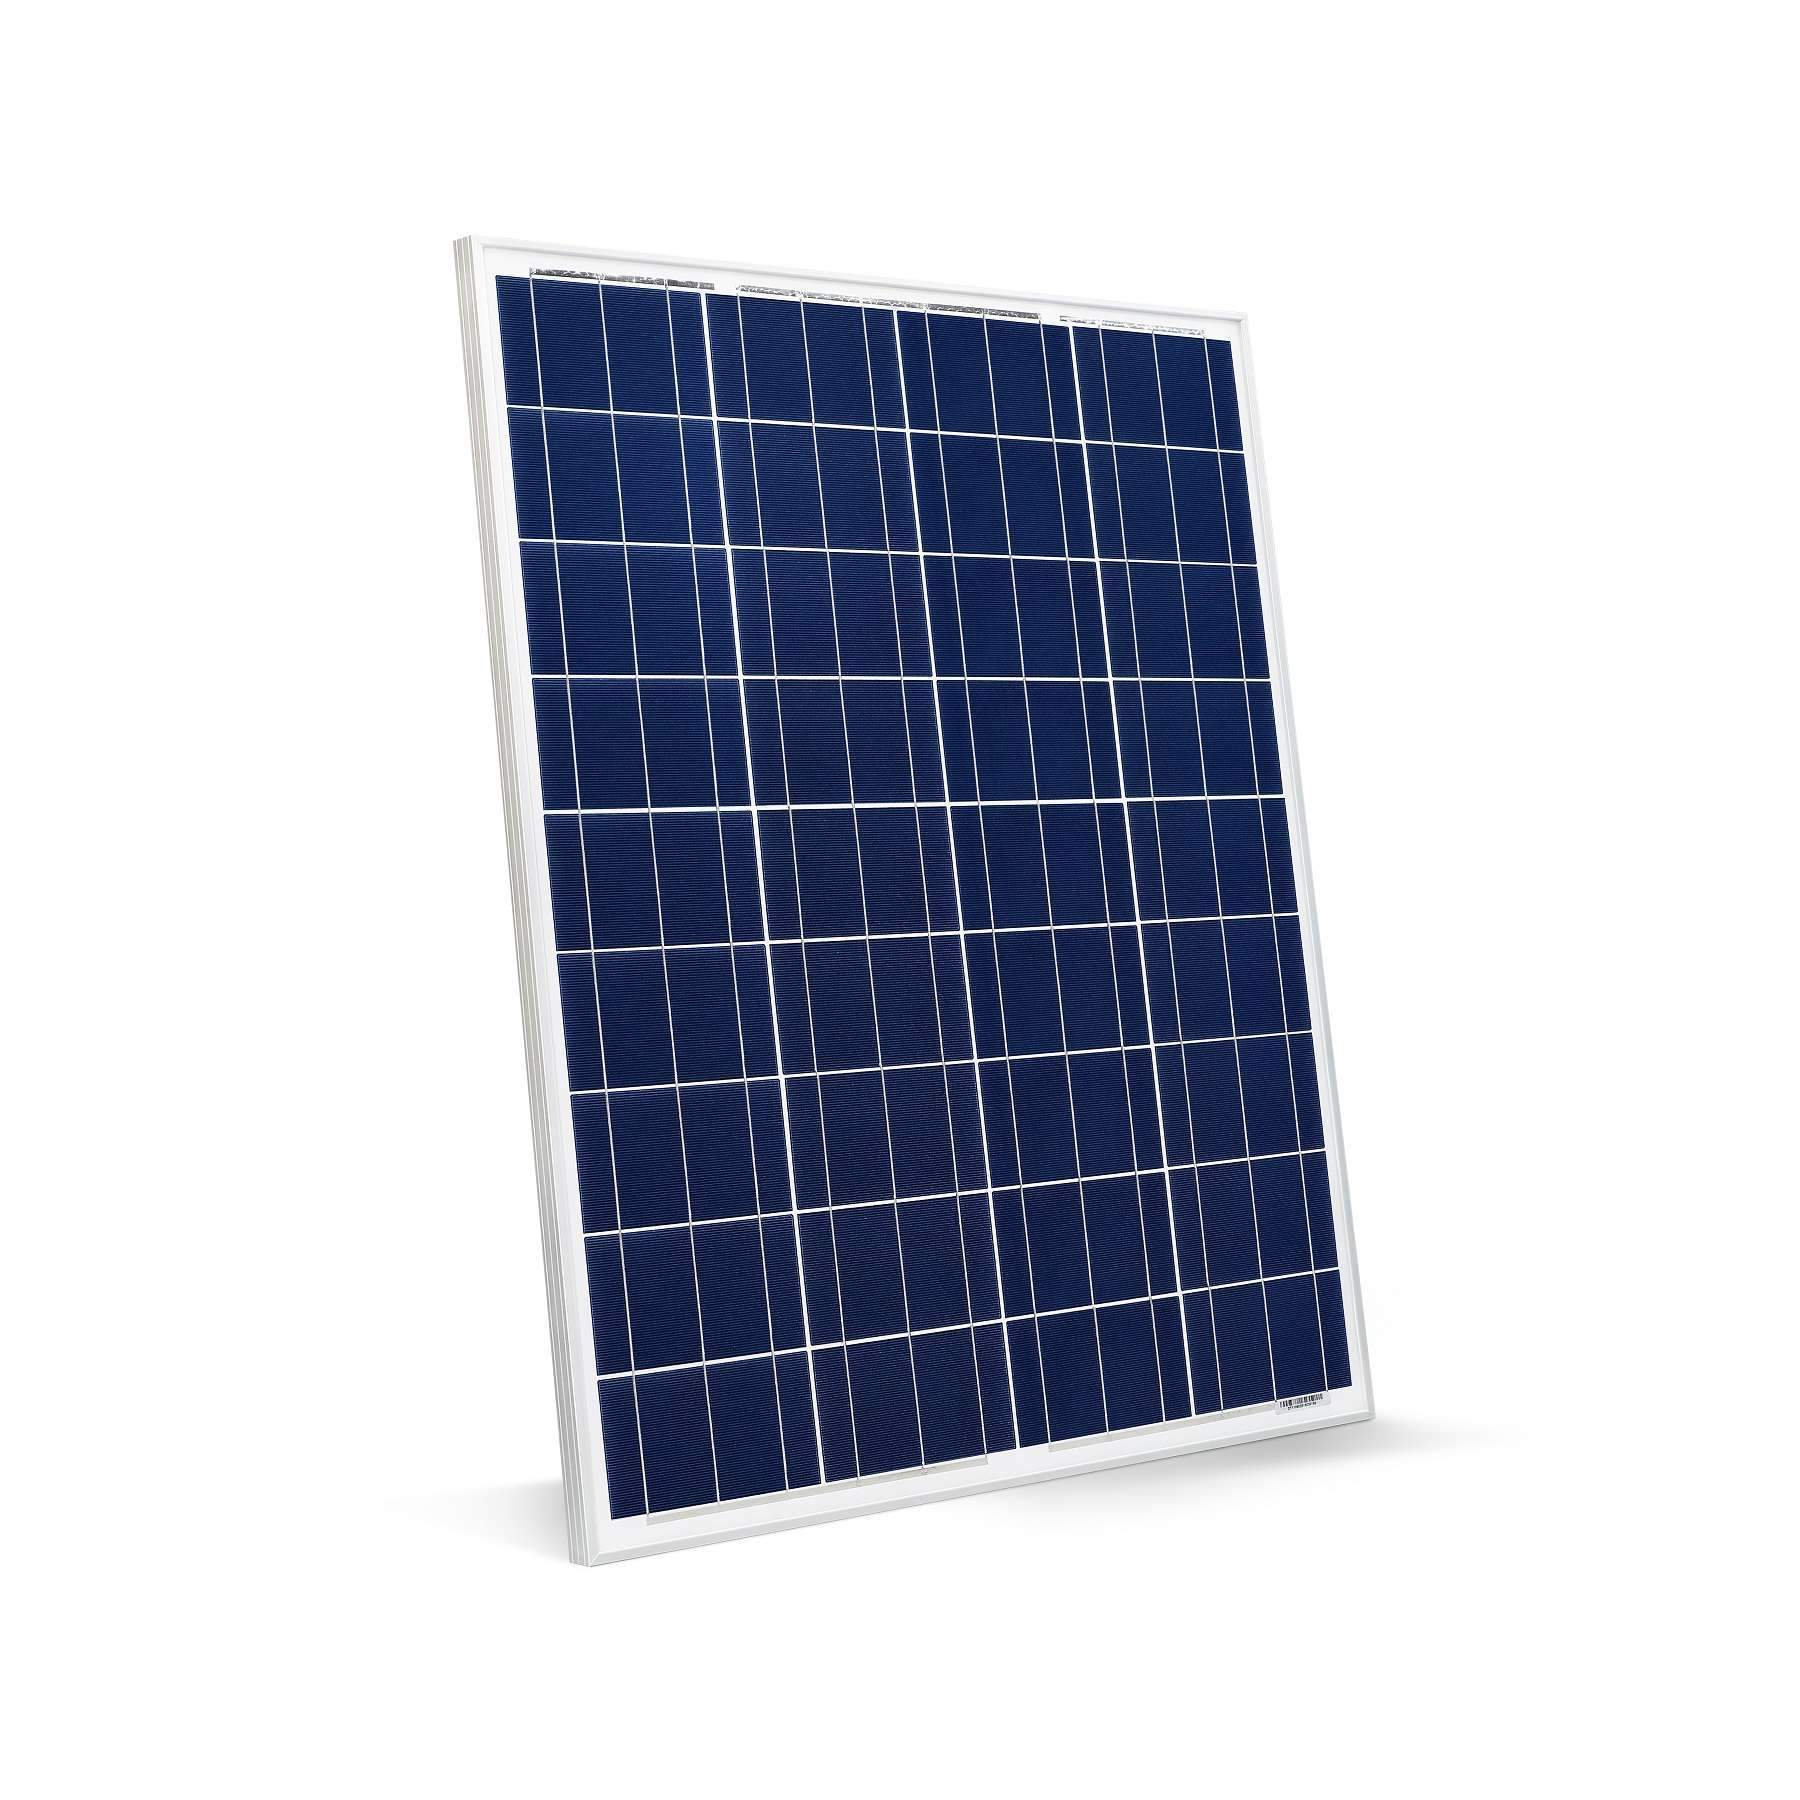 EnerSol 80 Watt solar panel South Africa